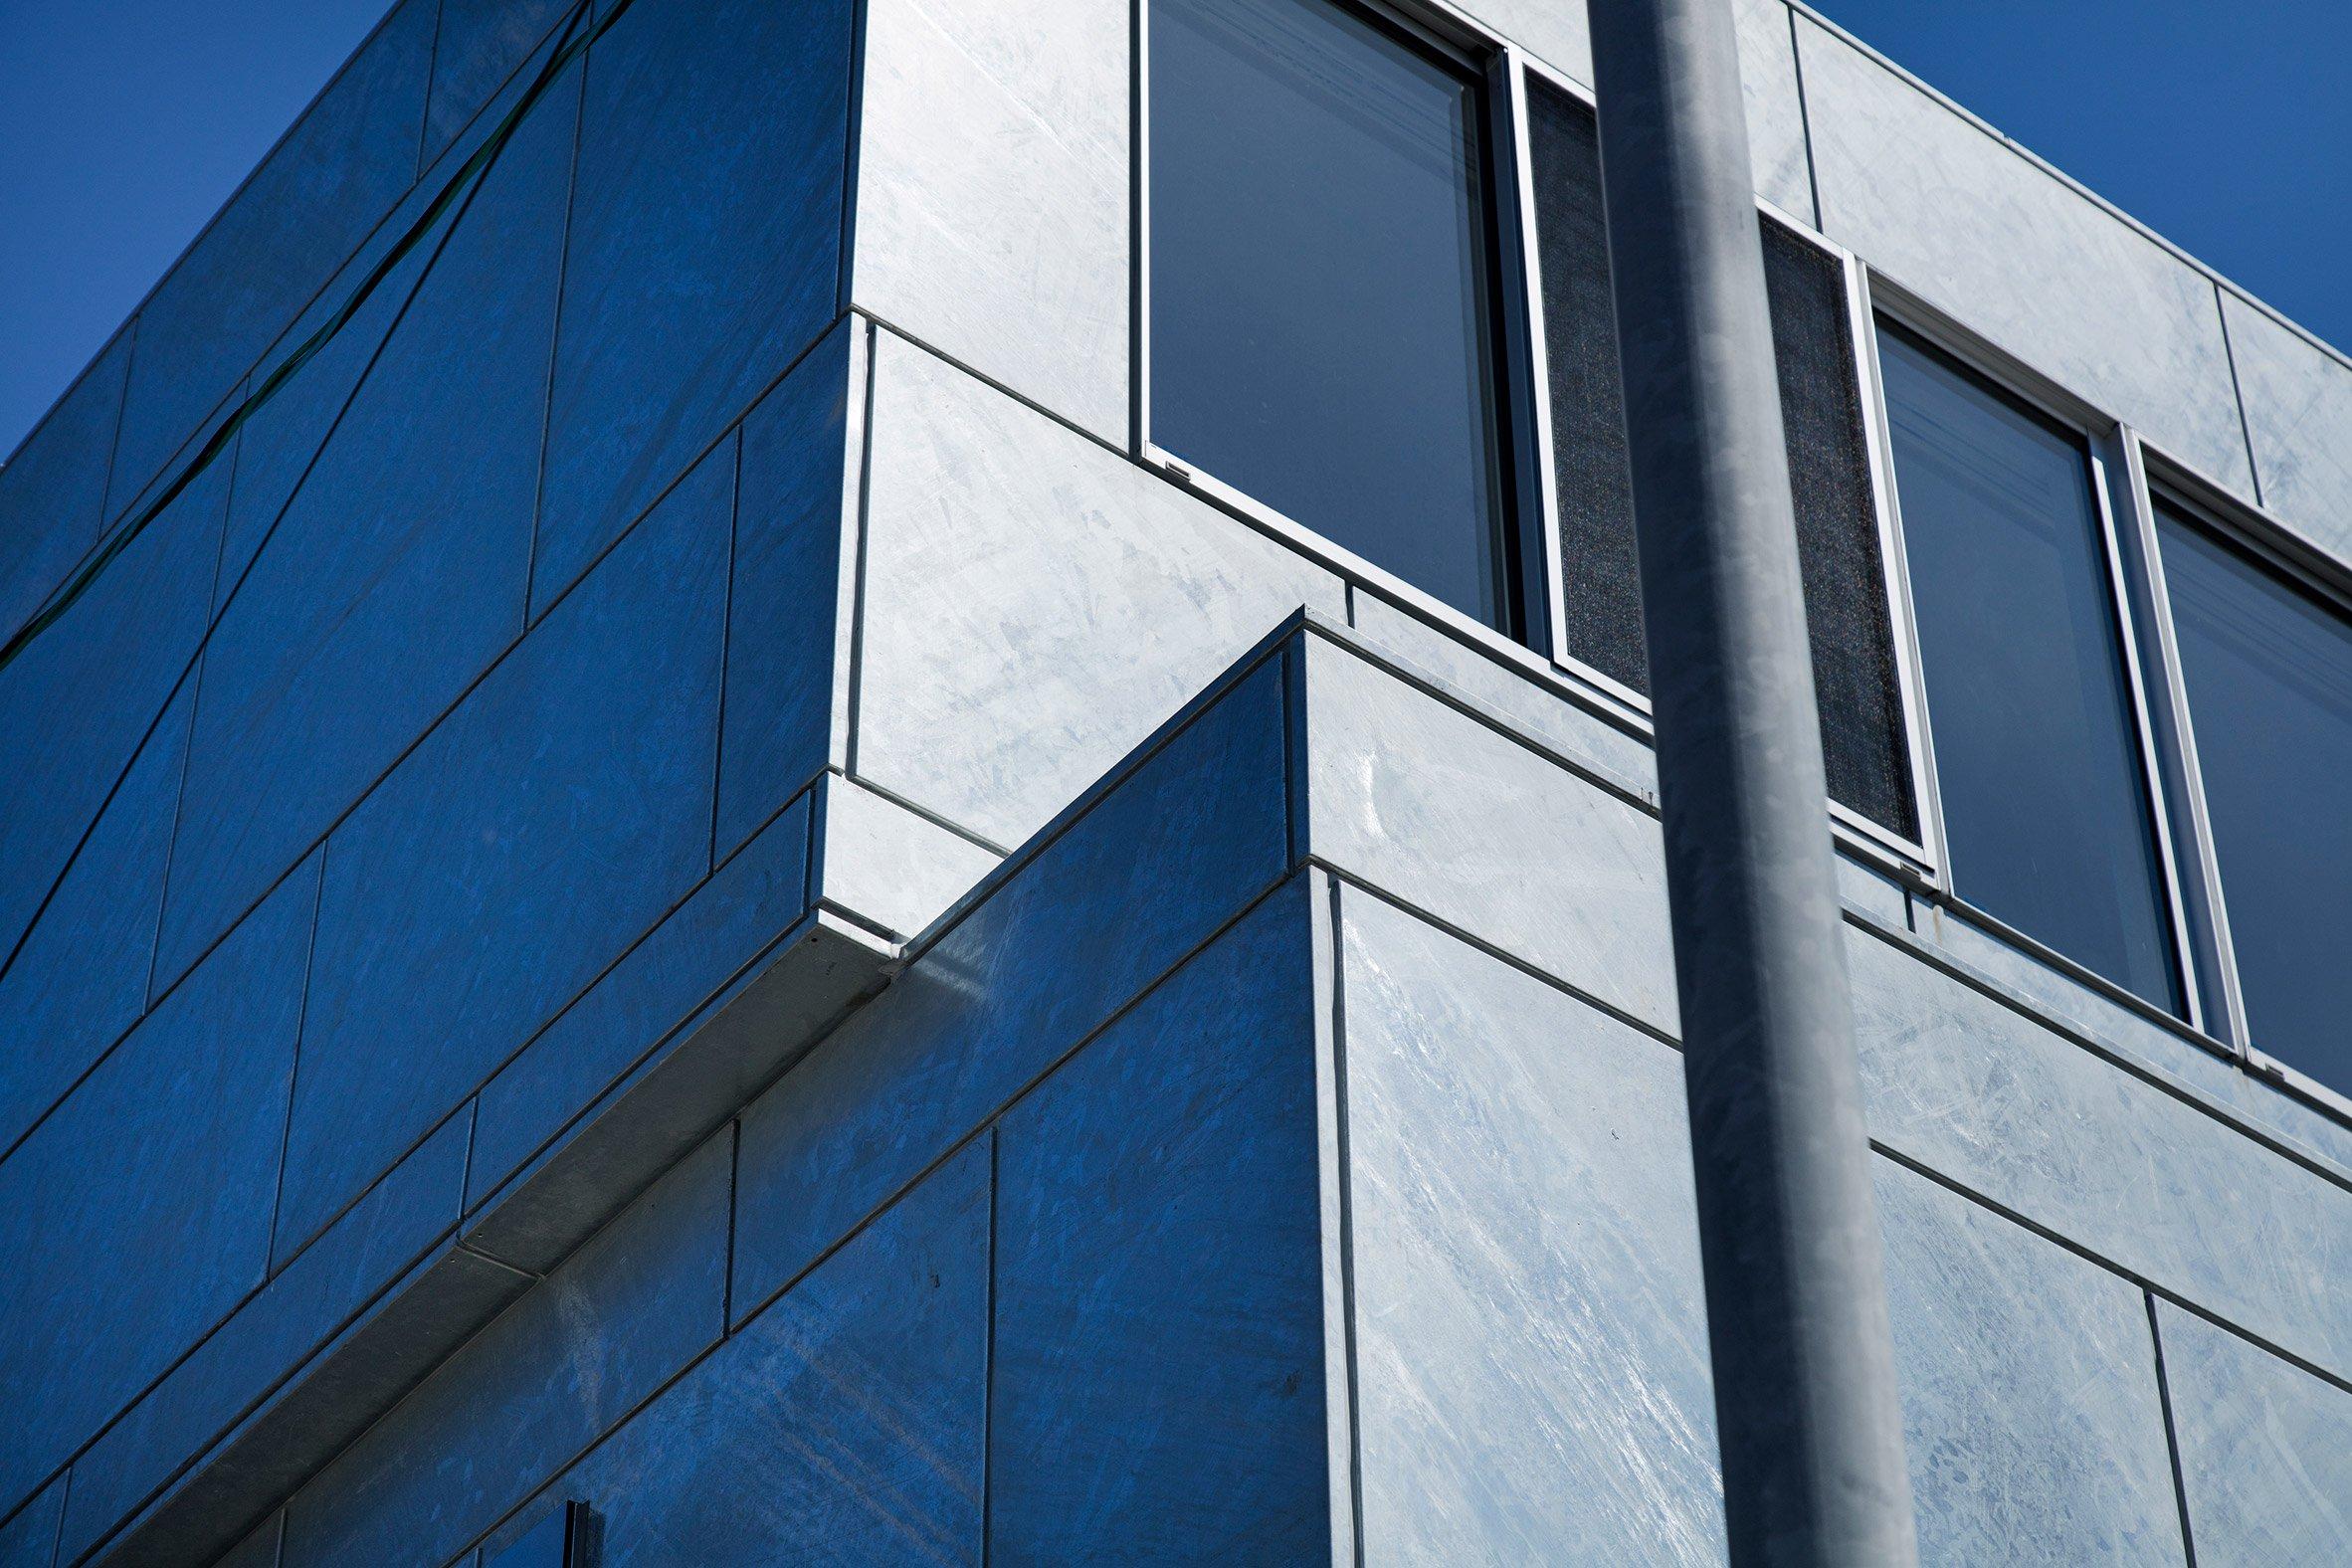 shinbohon-house-k-yuichi-yoshida-associates-architecture-residential-japan-_dezeen_2364_col_4.jpg